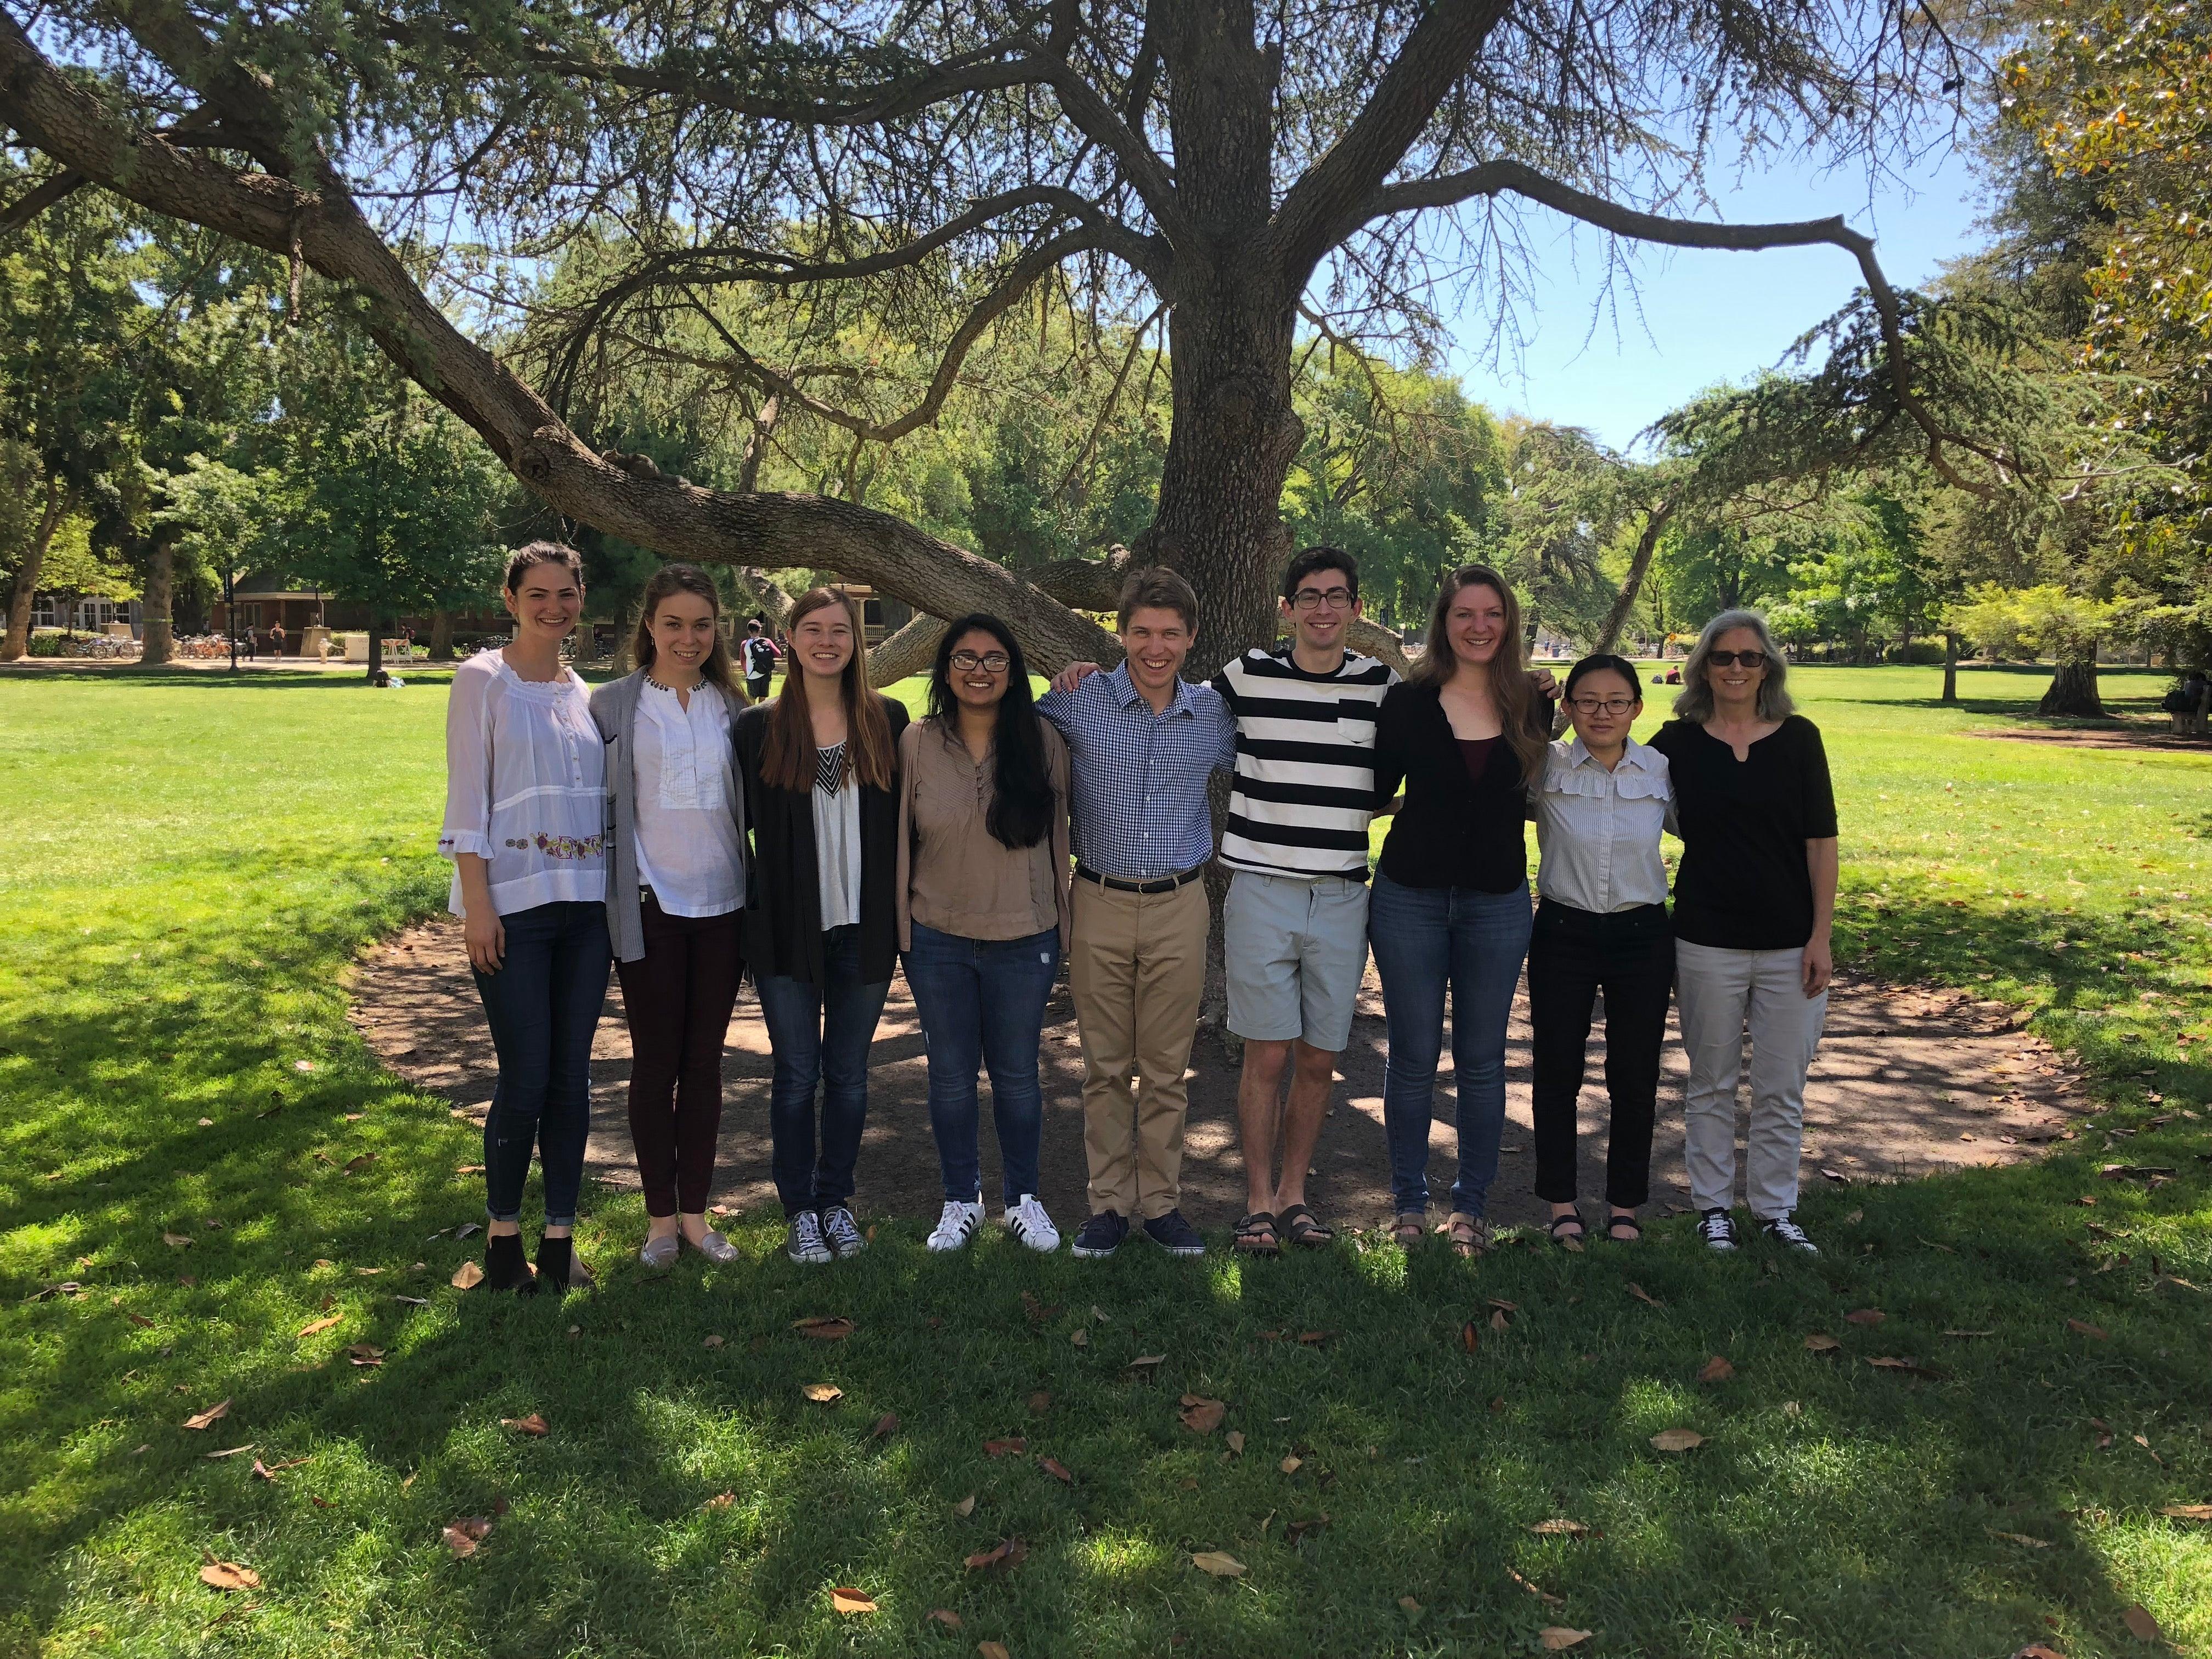 Editorial Board 2017-2018. (Left to Right) Sara, Anna, Rachel, Tannavee, Daniel, Bardia, Madison, Cathy, Dr. Burgess